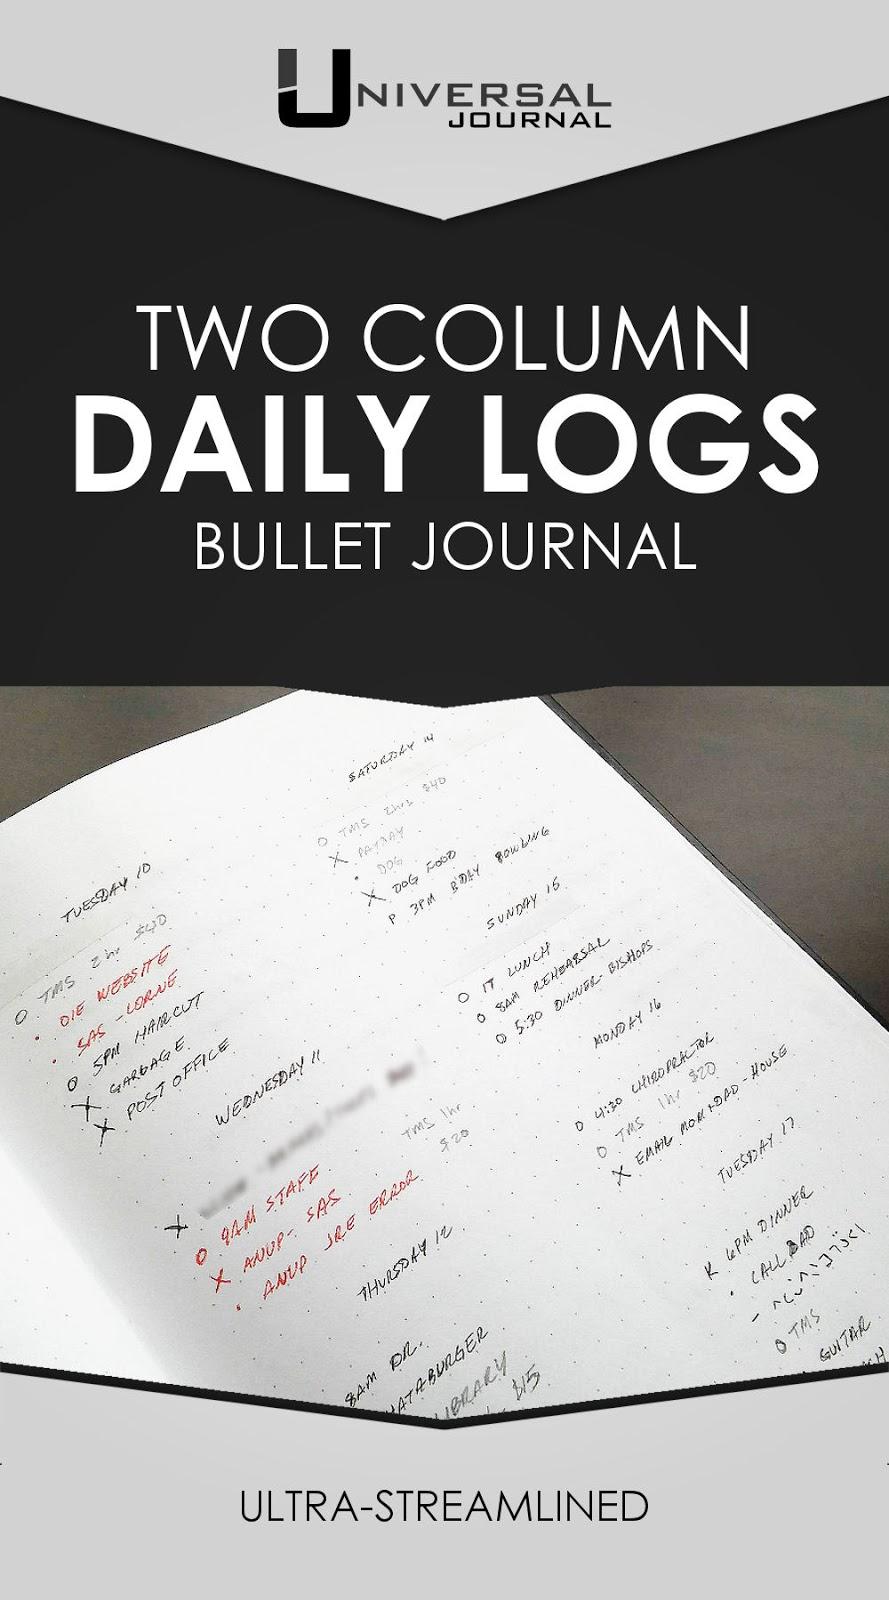 bullet journal two column daily logs